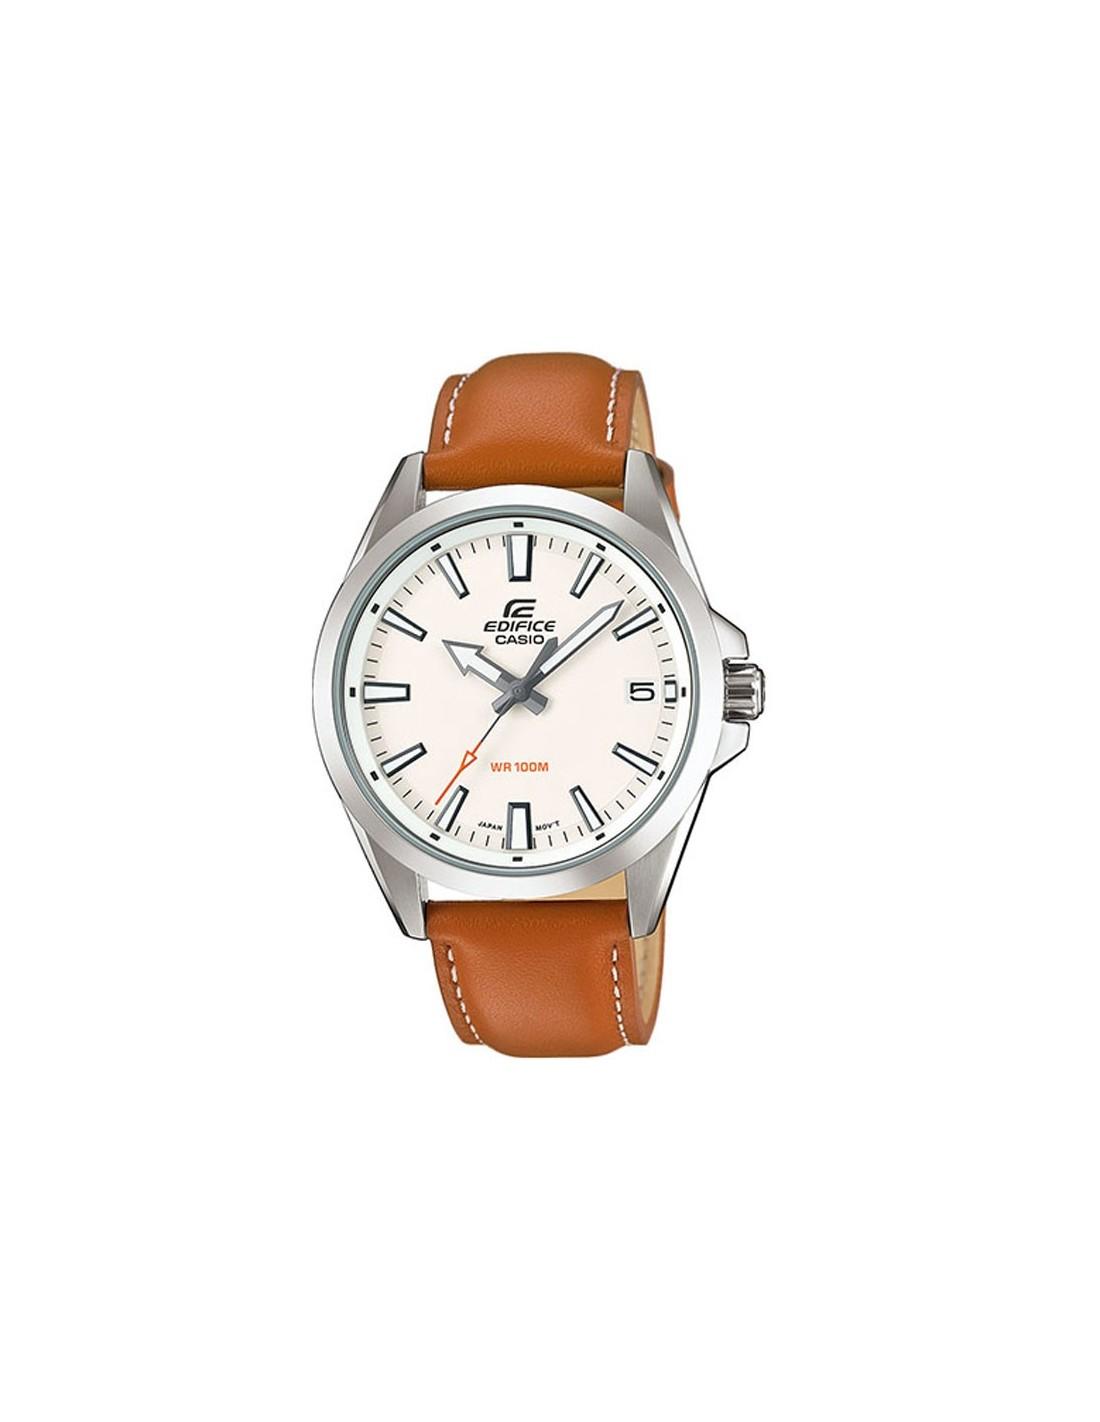 ffb01293d1a Relógio Casio Edifice EFV-100L-7AVUEF ...